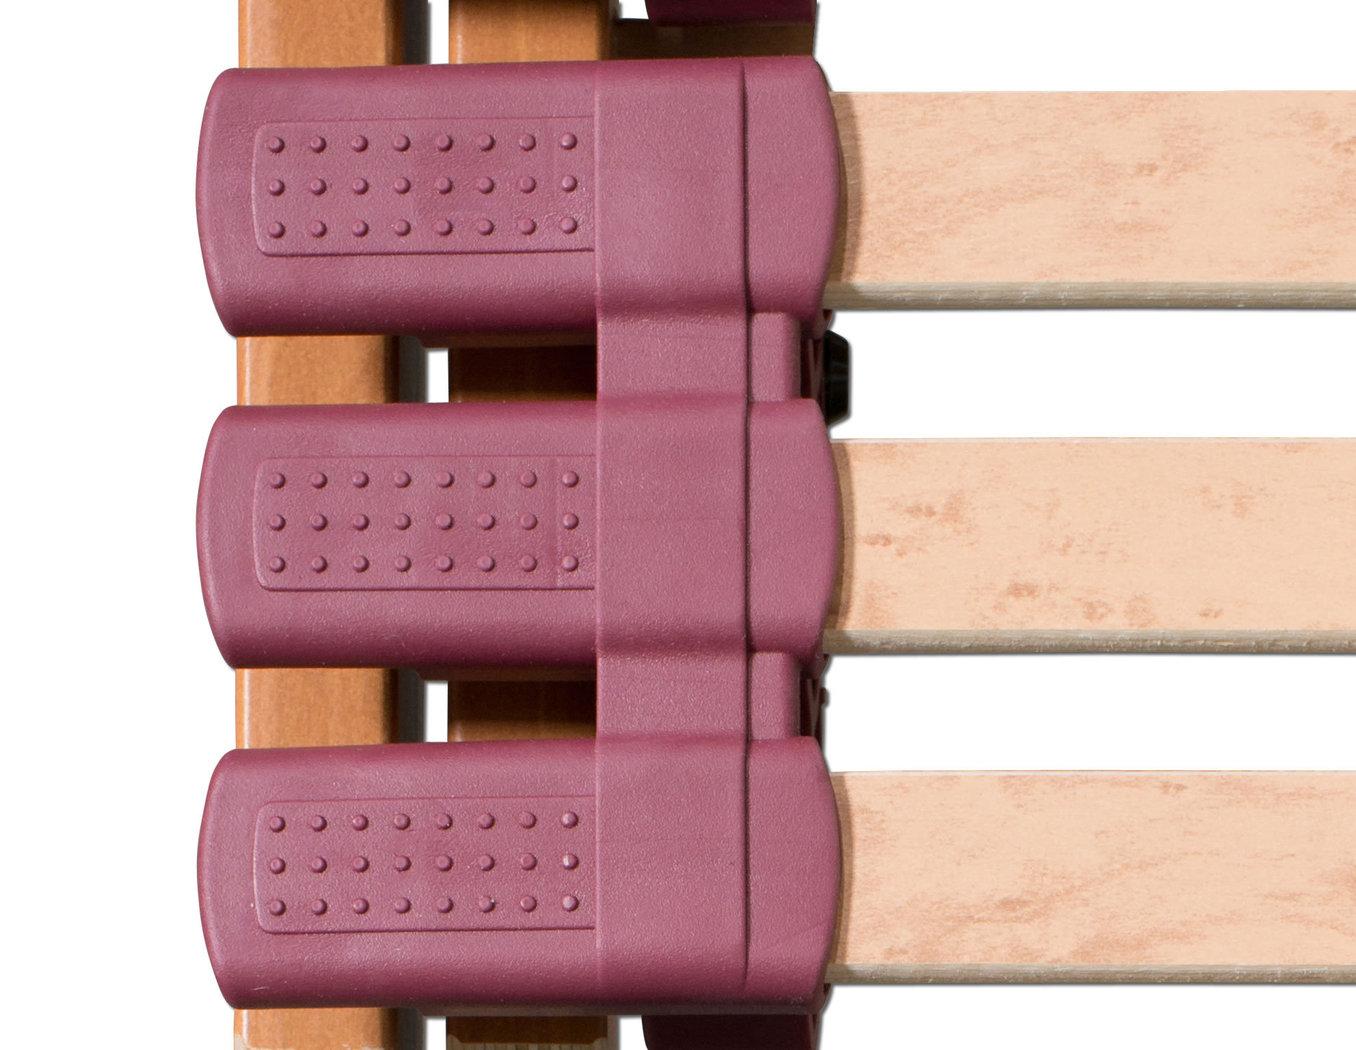 7 zonen lattenrost rhodos kf kopf und fu teil. Black Bedroom Furniture Sets. Home Design Ideas